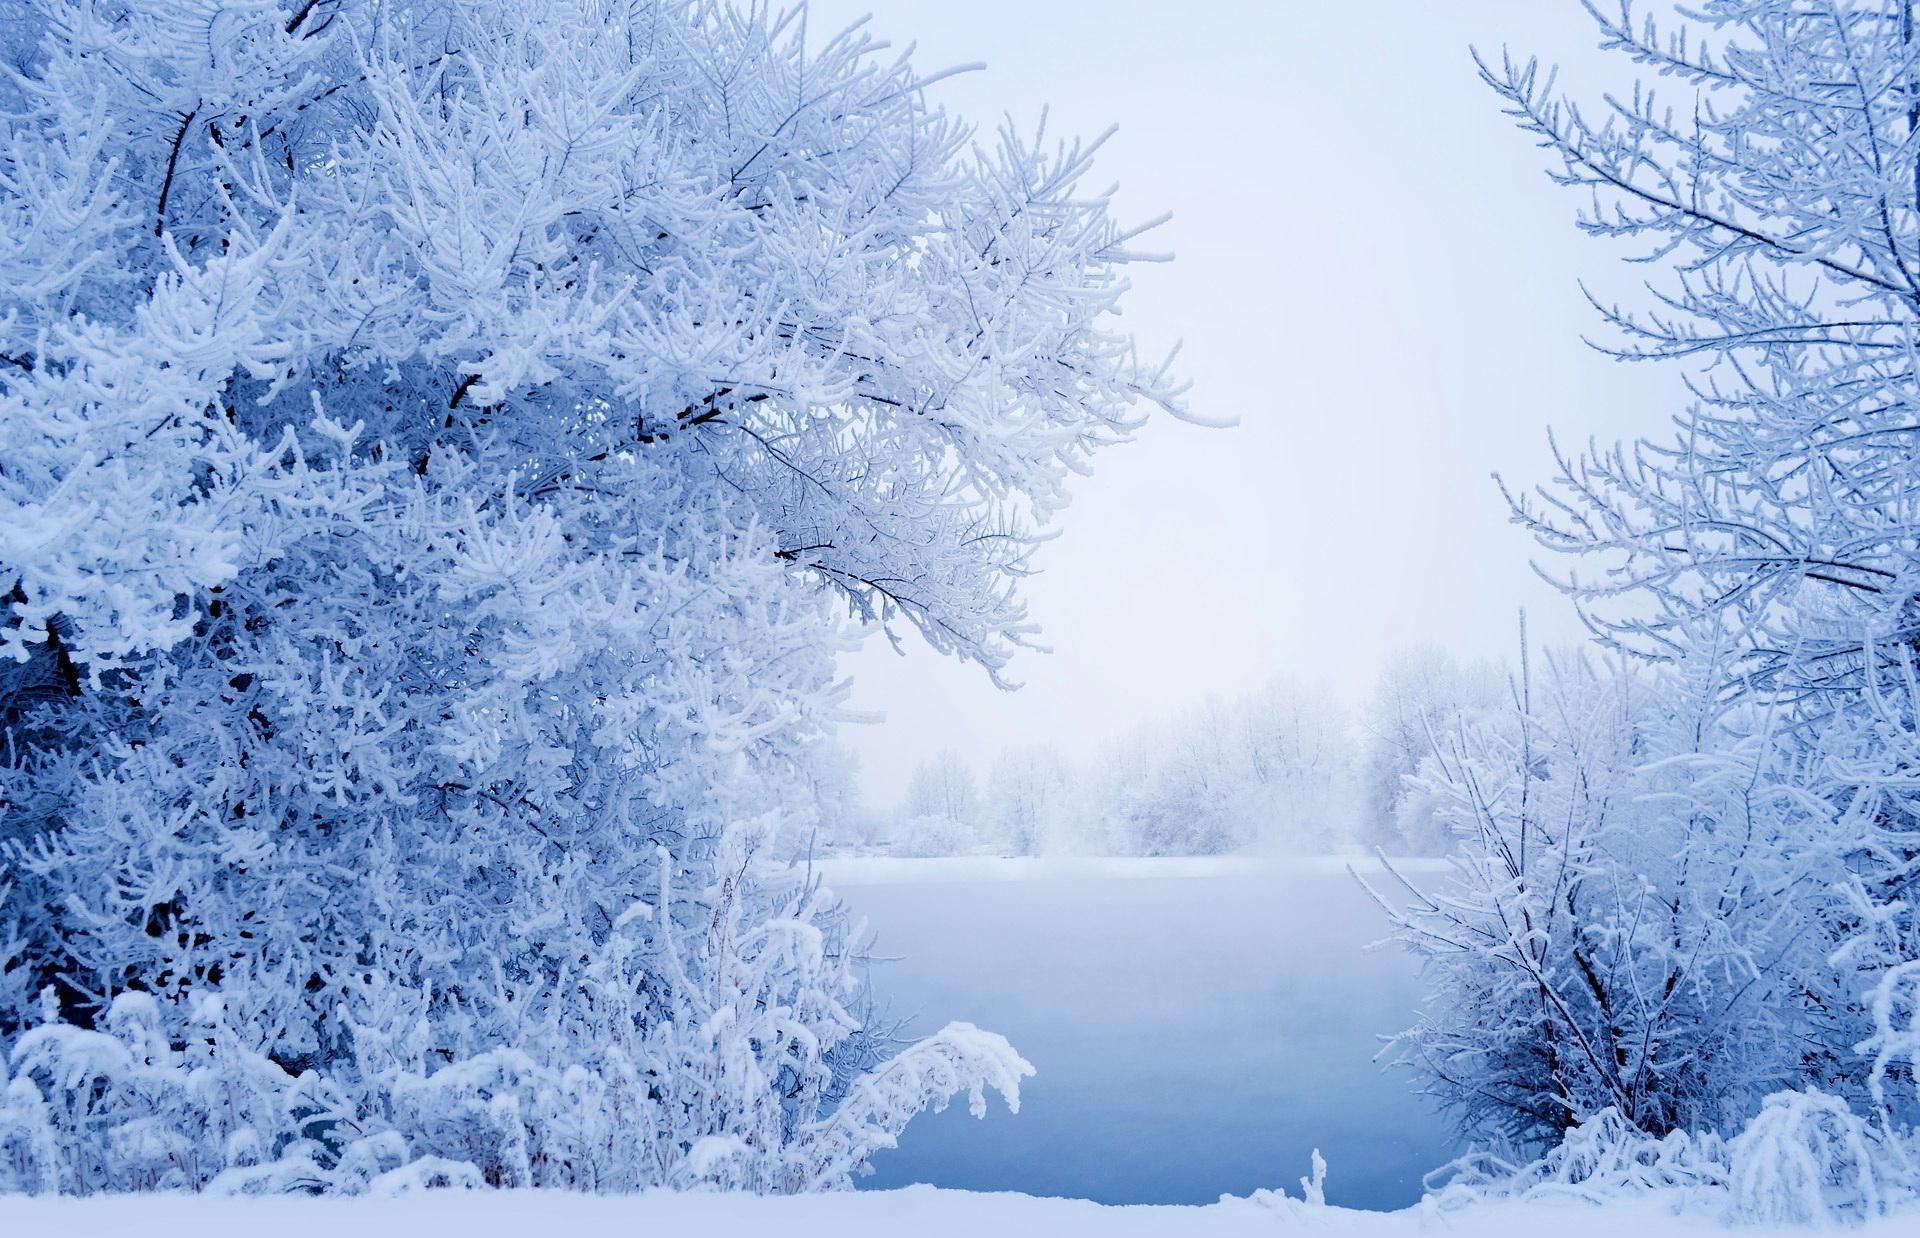 Best Wallpaper Love Winter - 09e1217574c0a1dda573f033e4494a06  Trends_74415.jpg